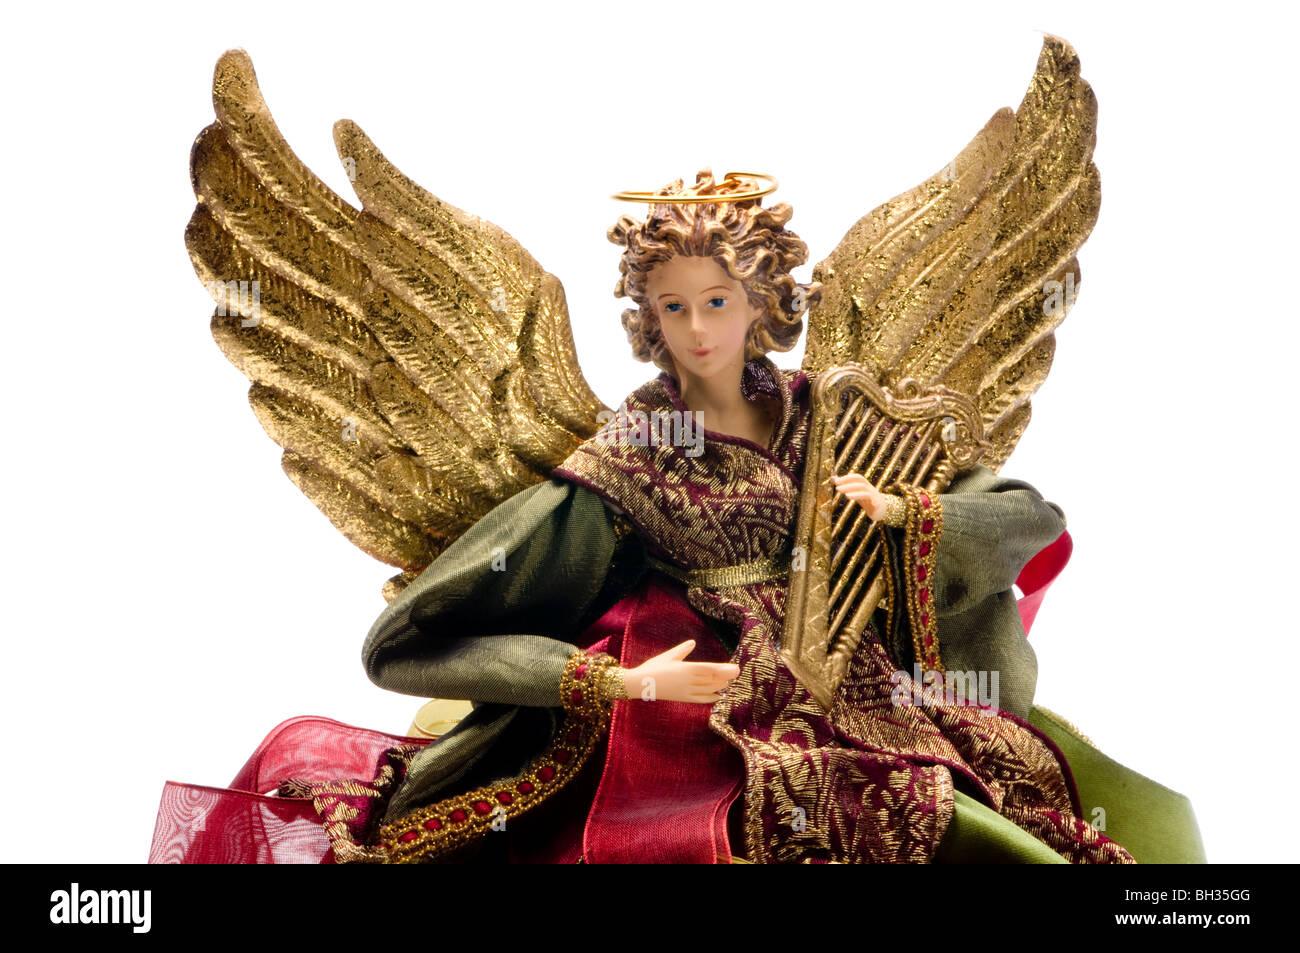 angel doll on white - Stock Image